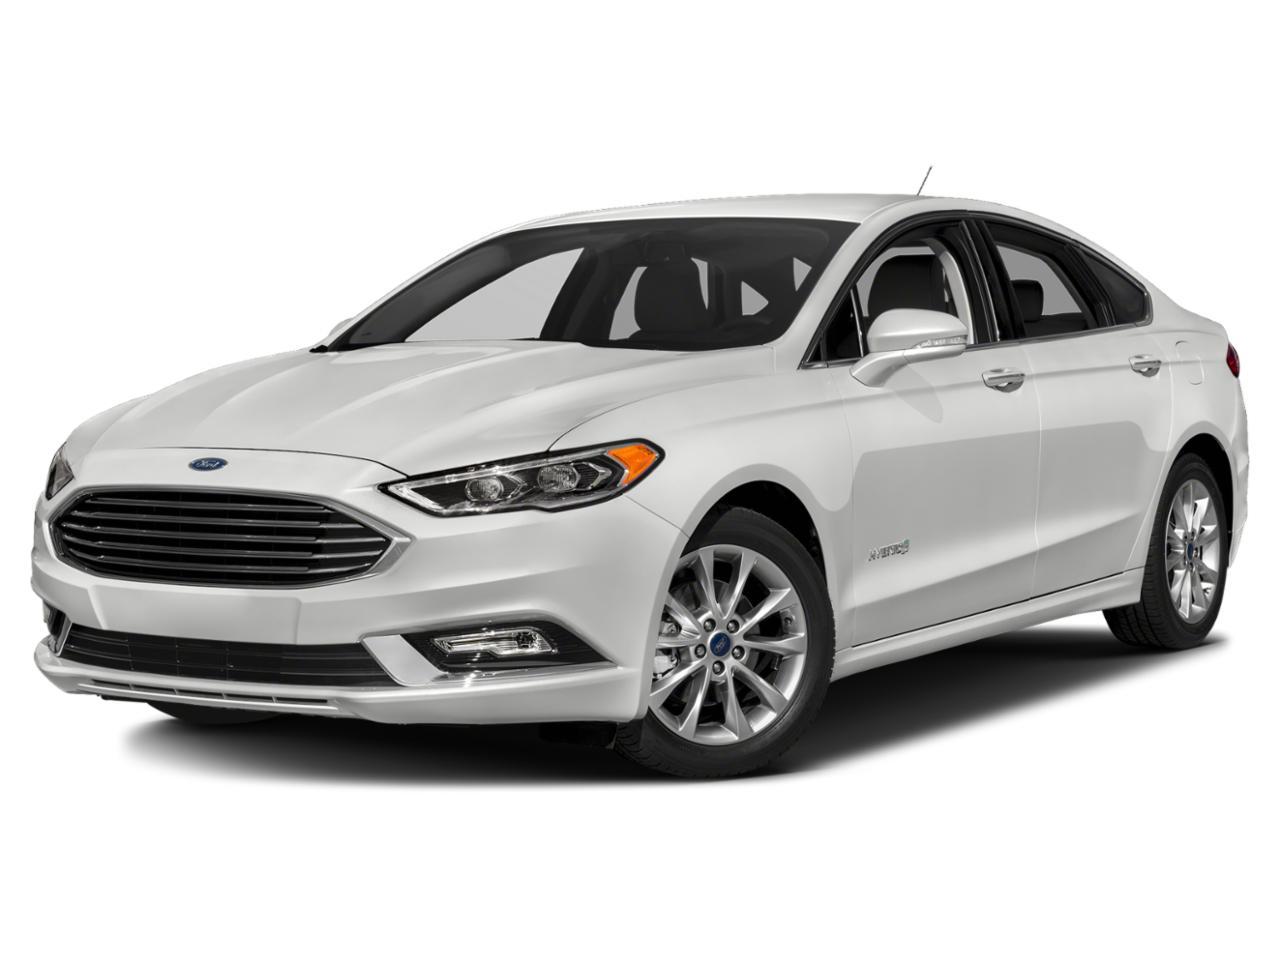 2018 Ford Fusion Hybrid SE 4dr Car Slide 0